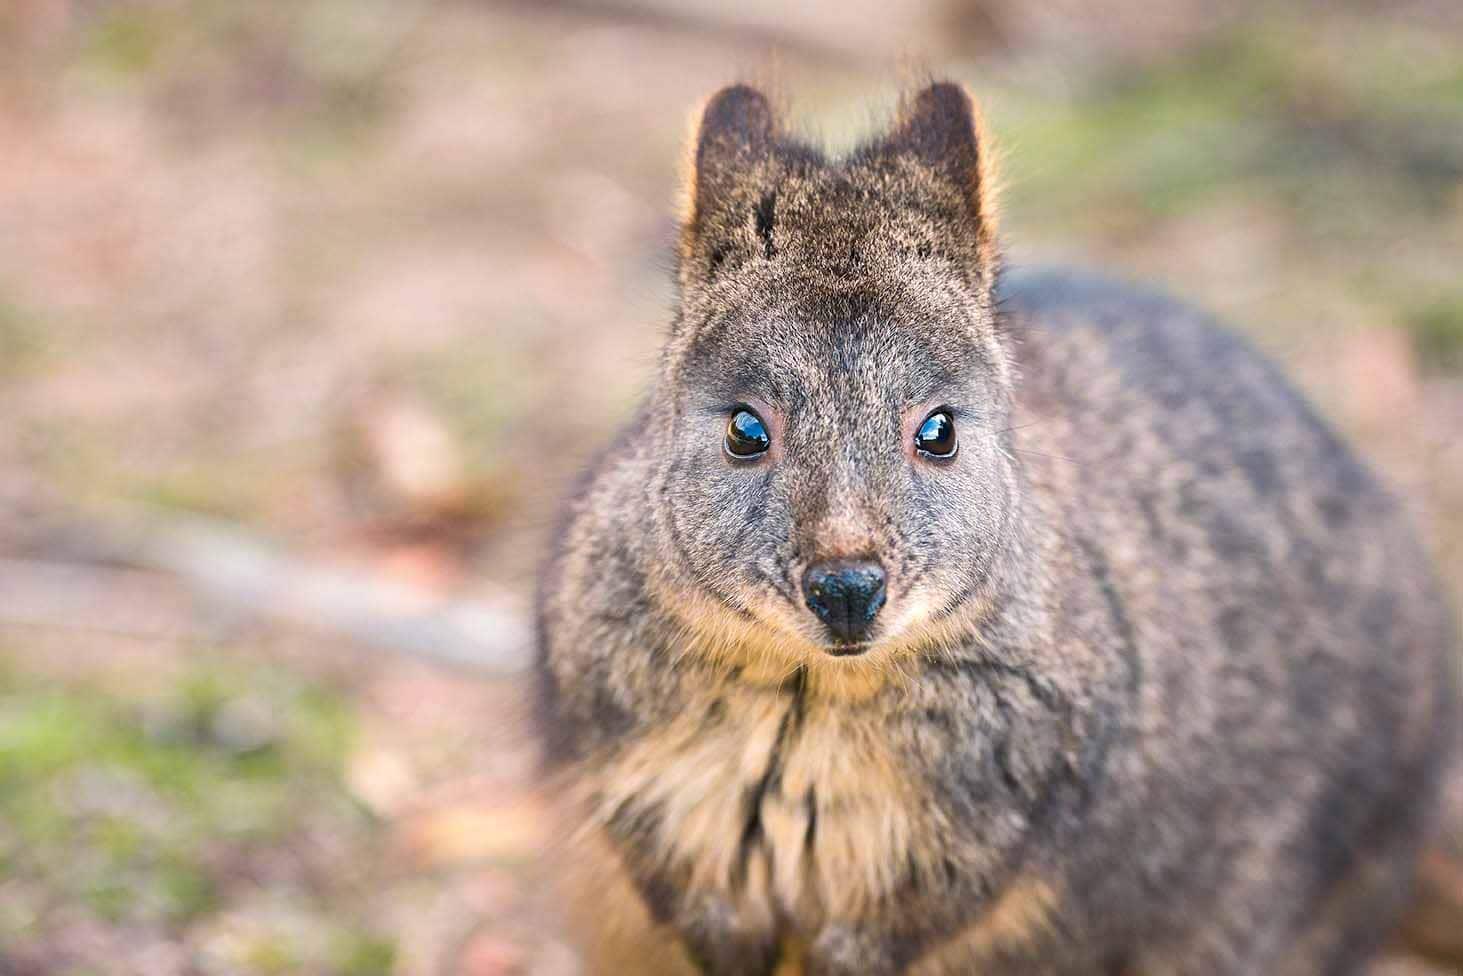 pademelon marsupial thylogale australie robin favier kangaroo australia tasmania wild ecology animal animaux earth nature